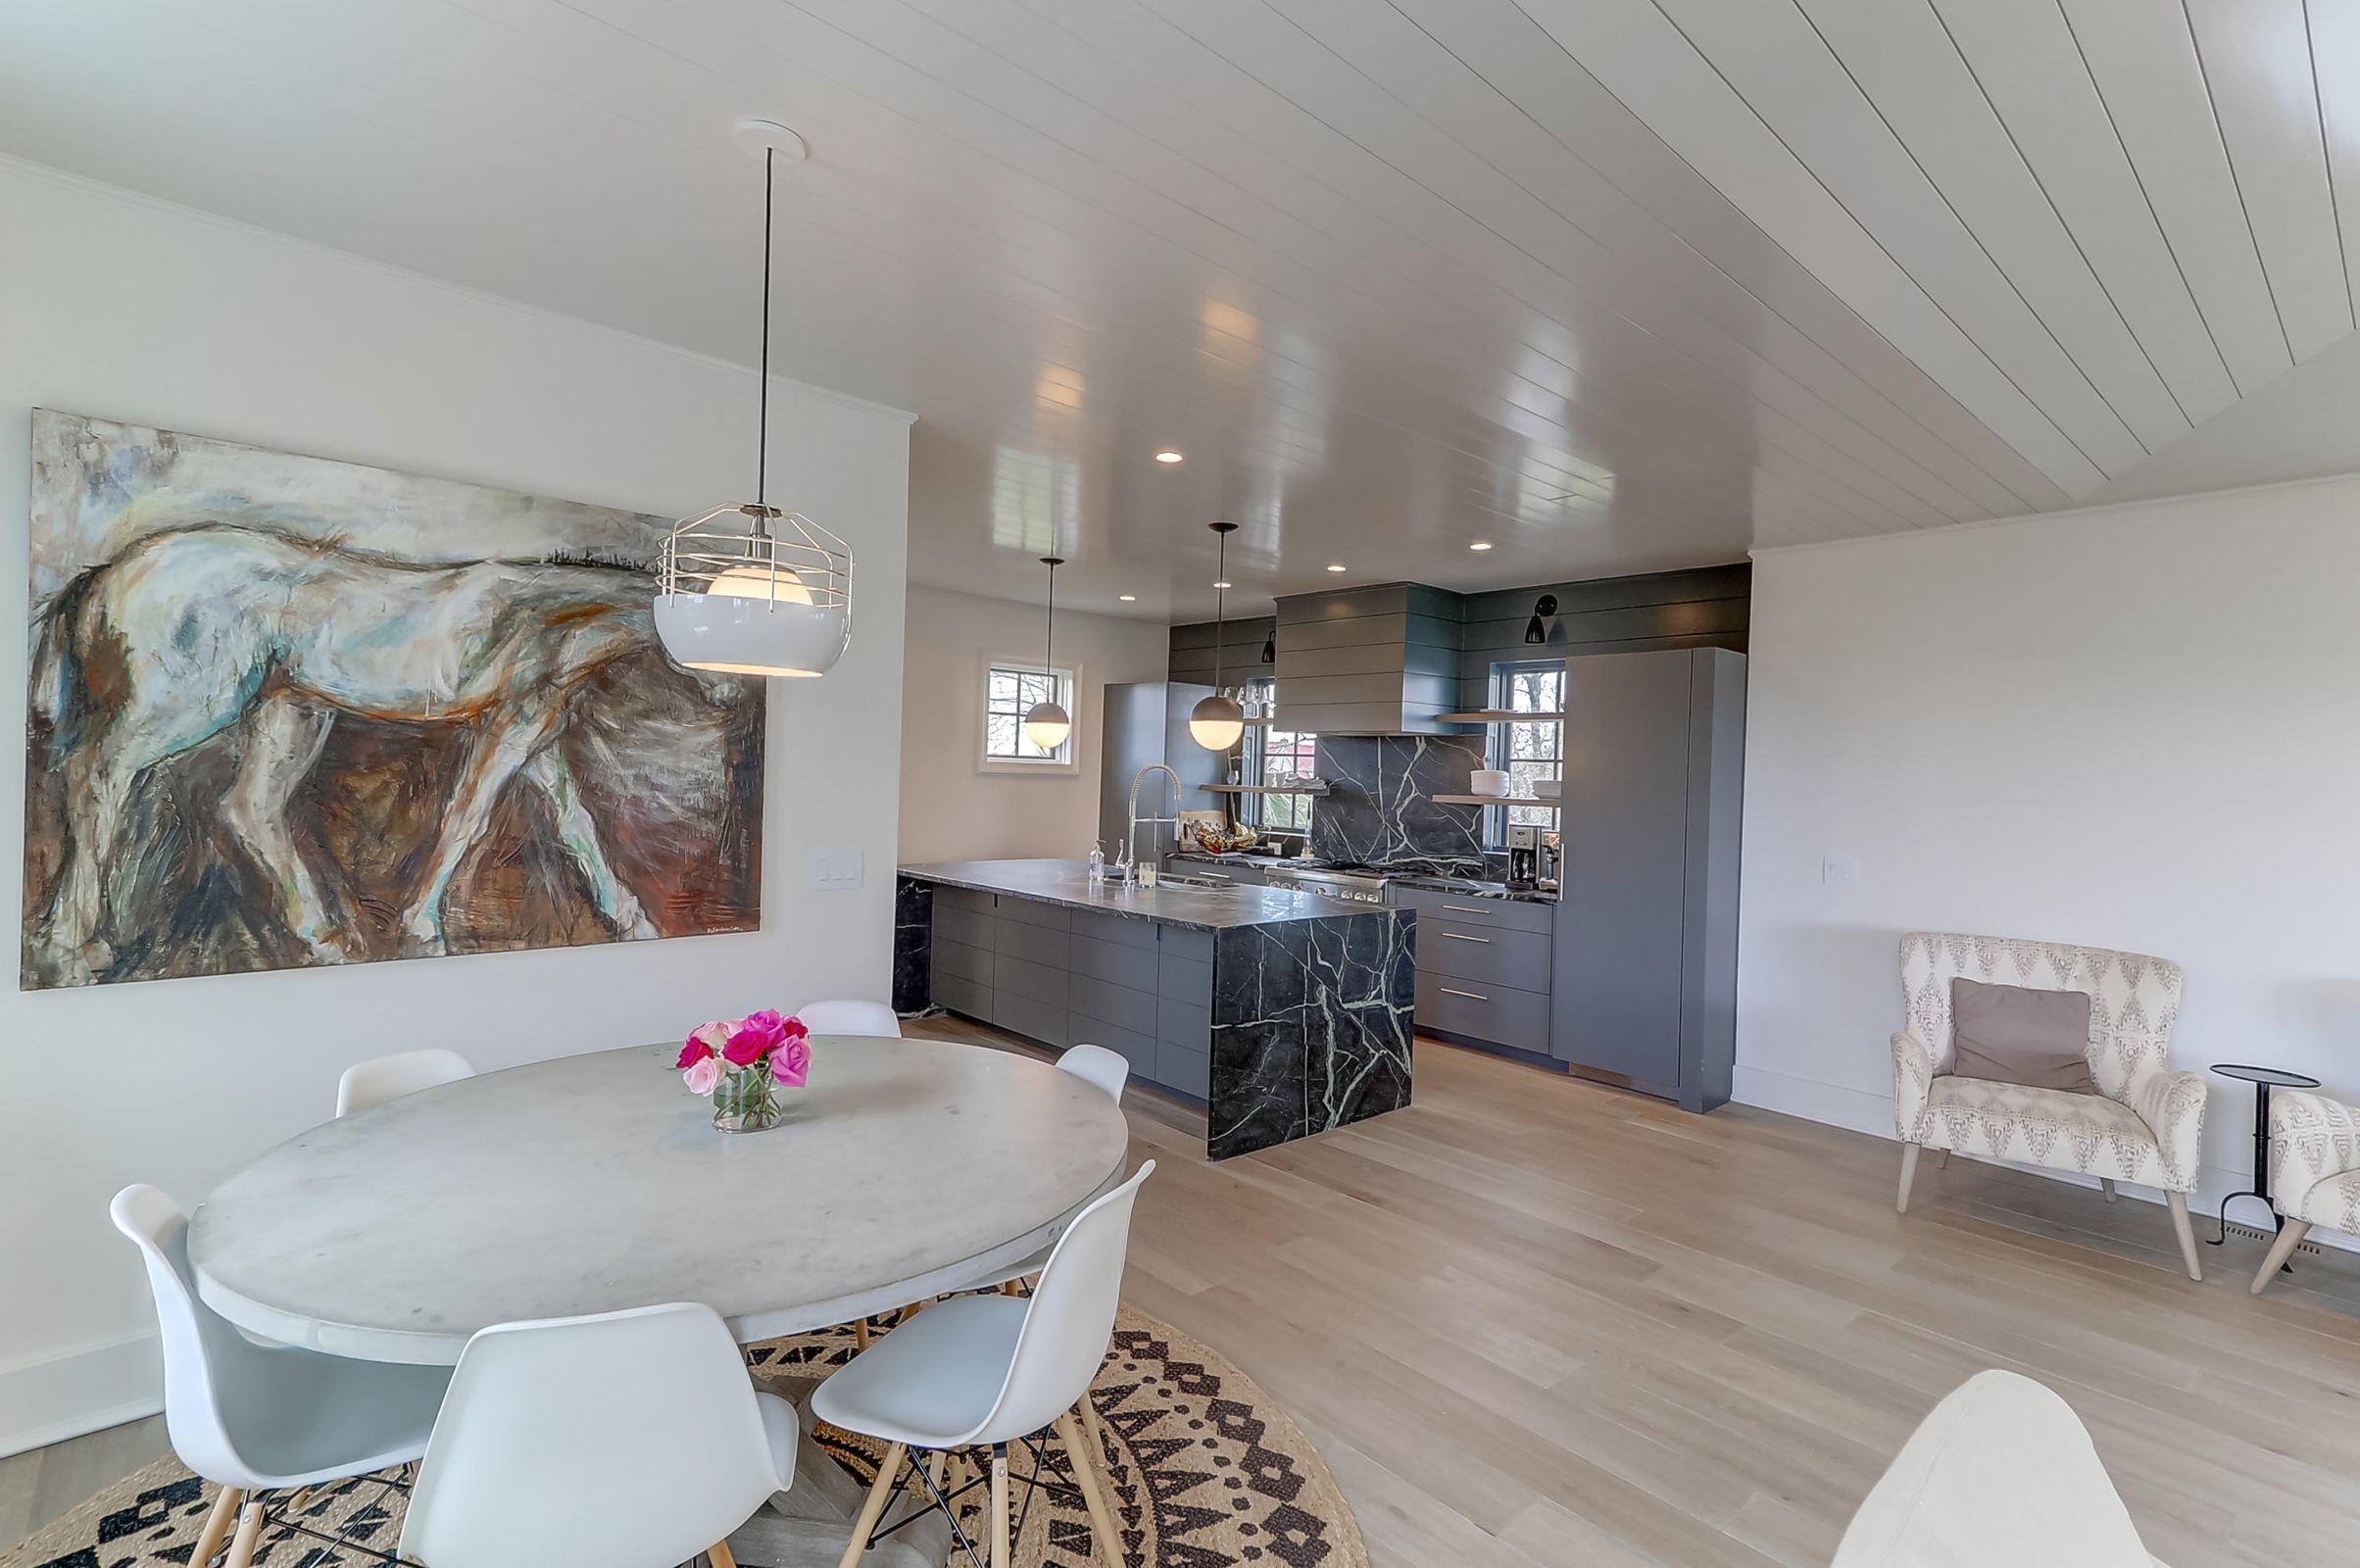 Sullivans Island Homes For Sale - 918 Middle, Sullivans Island, SC - 15